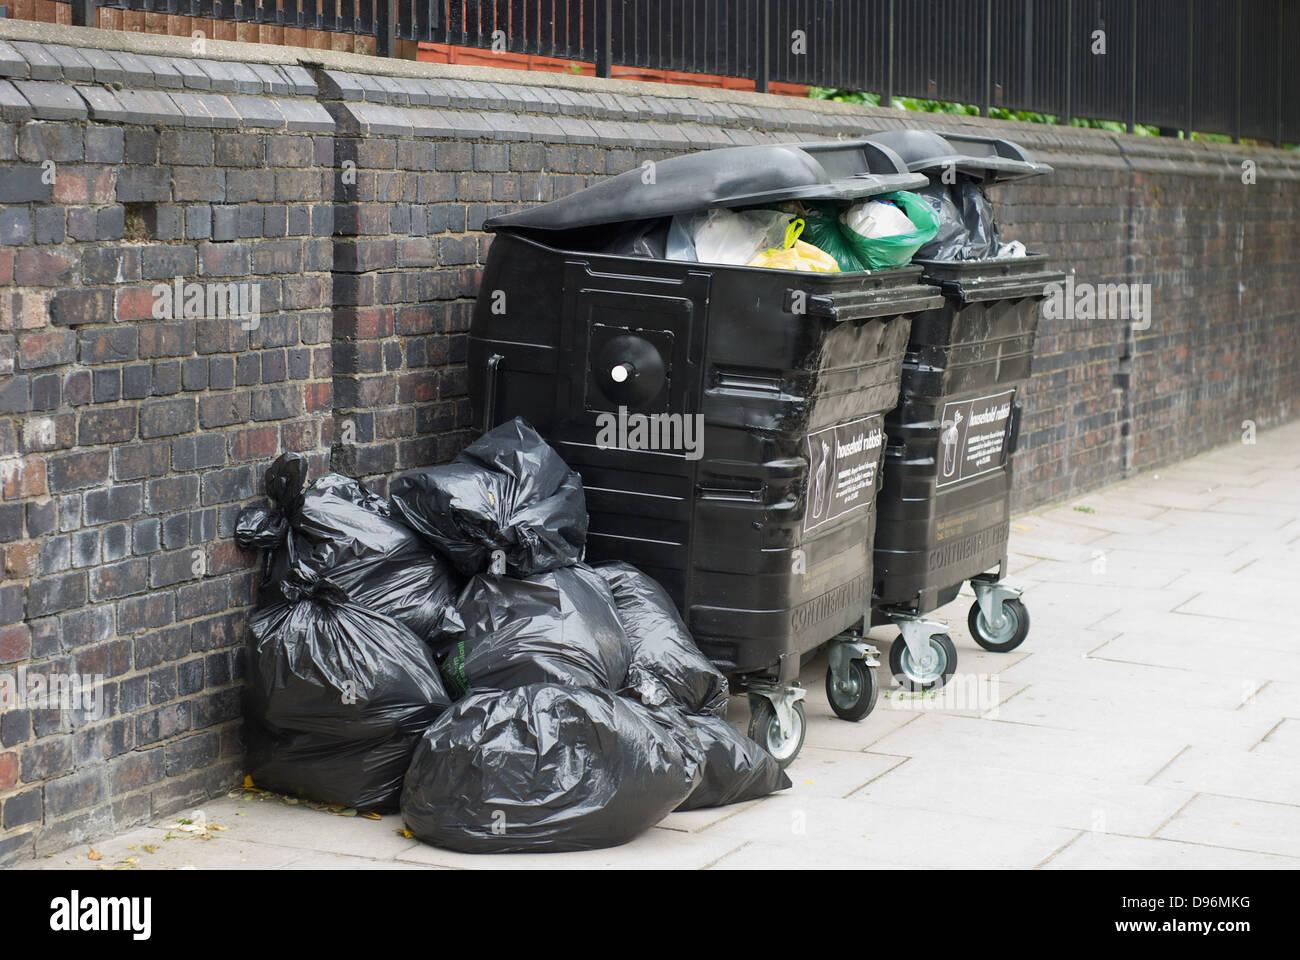 Overloaded rubbish bins in St. John's Wood London UK Stock Photo